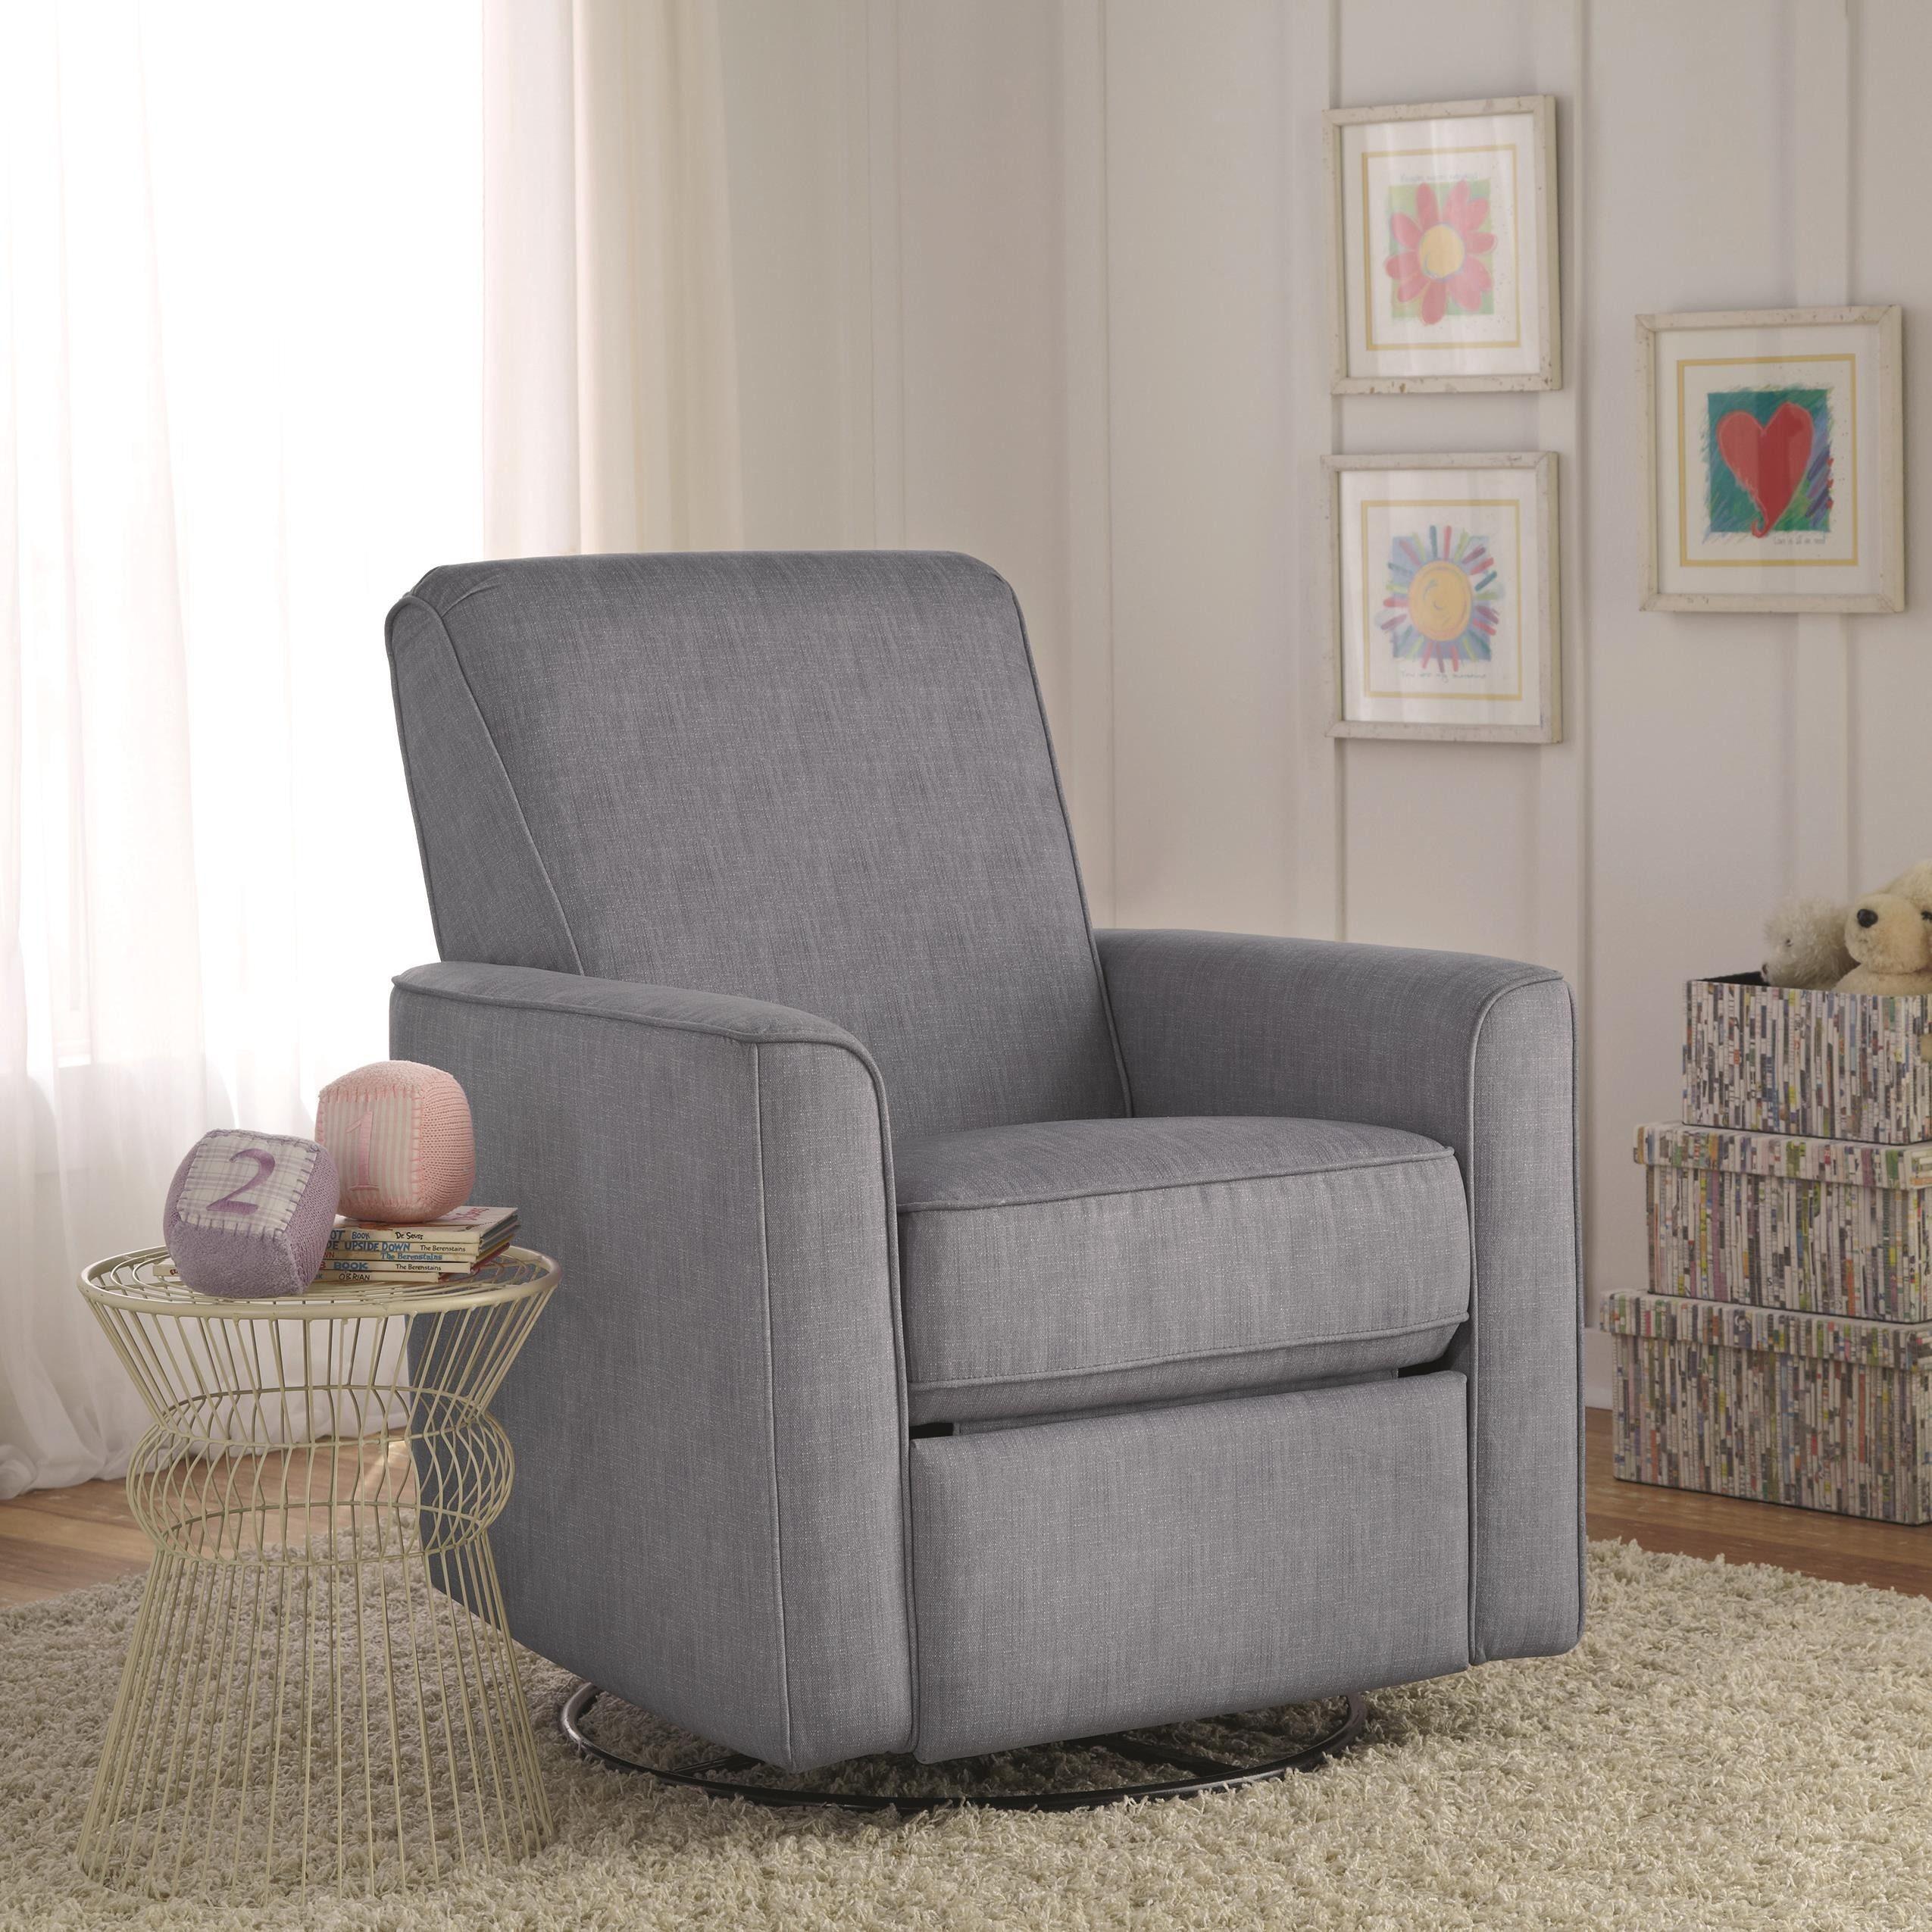 Zoey grey nursery swivel glider recliner chair is